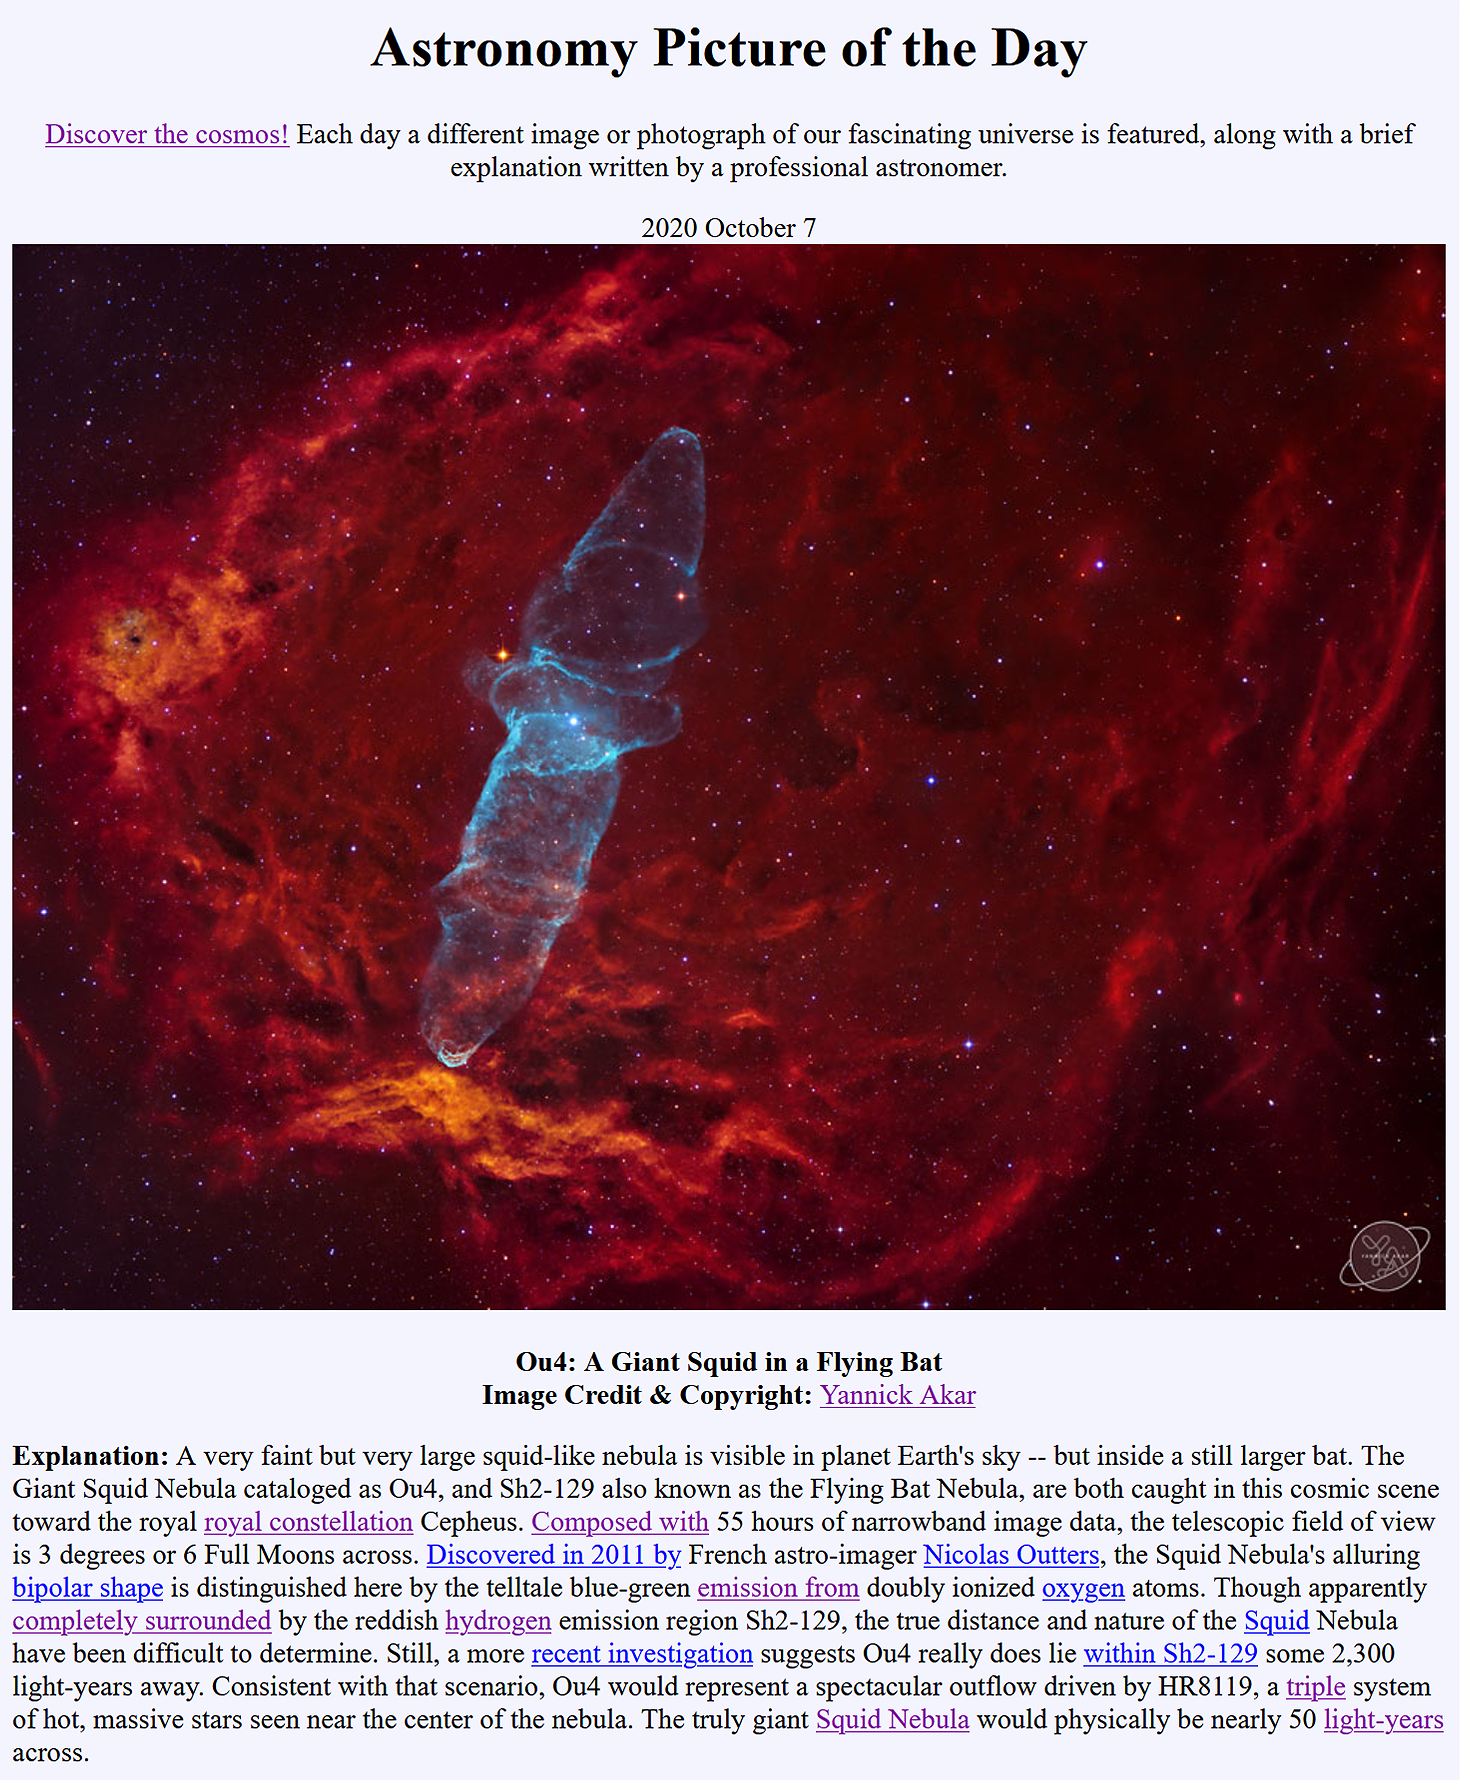 Sh2-129 & Ou4 - The Flying Bat and Giant Squid Nebula,                                Yannick Akar